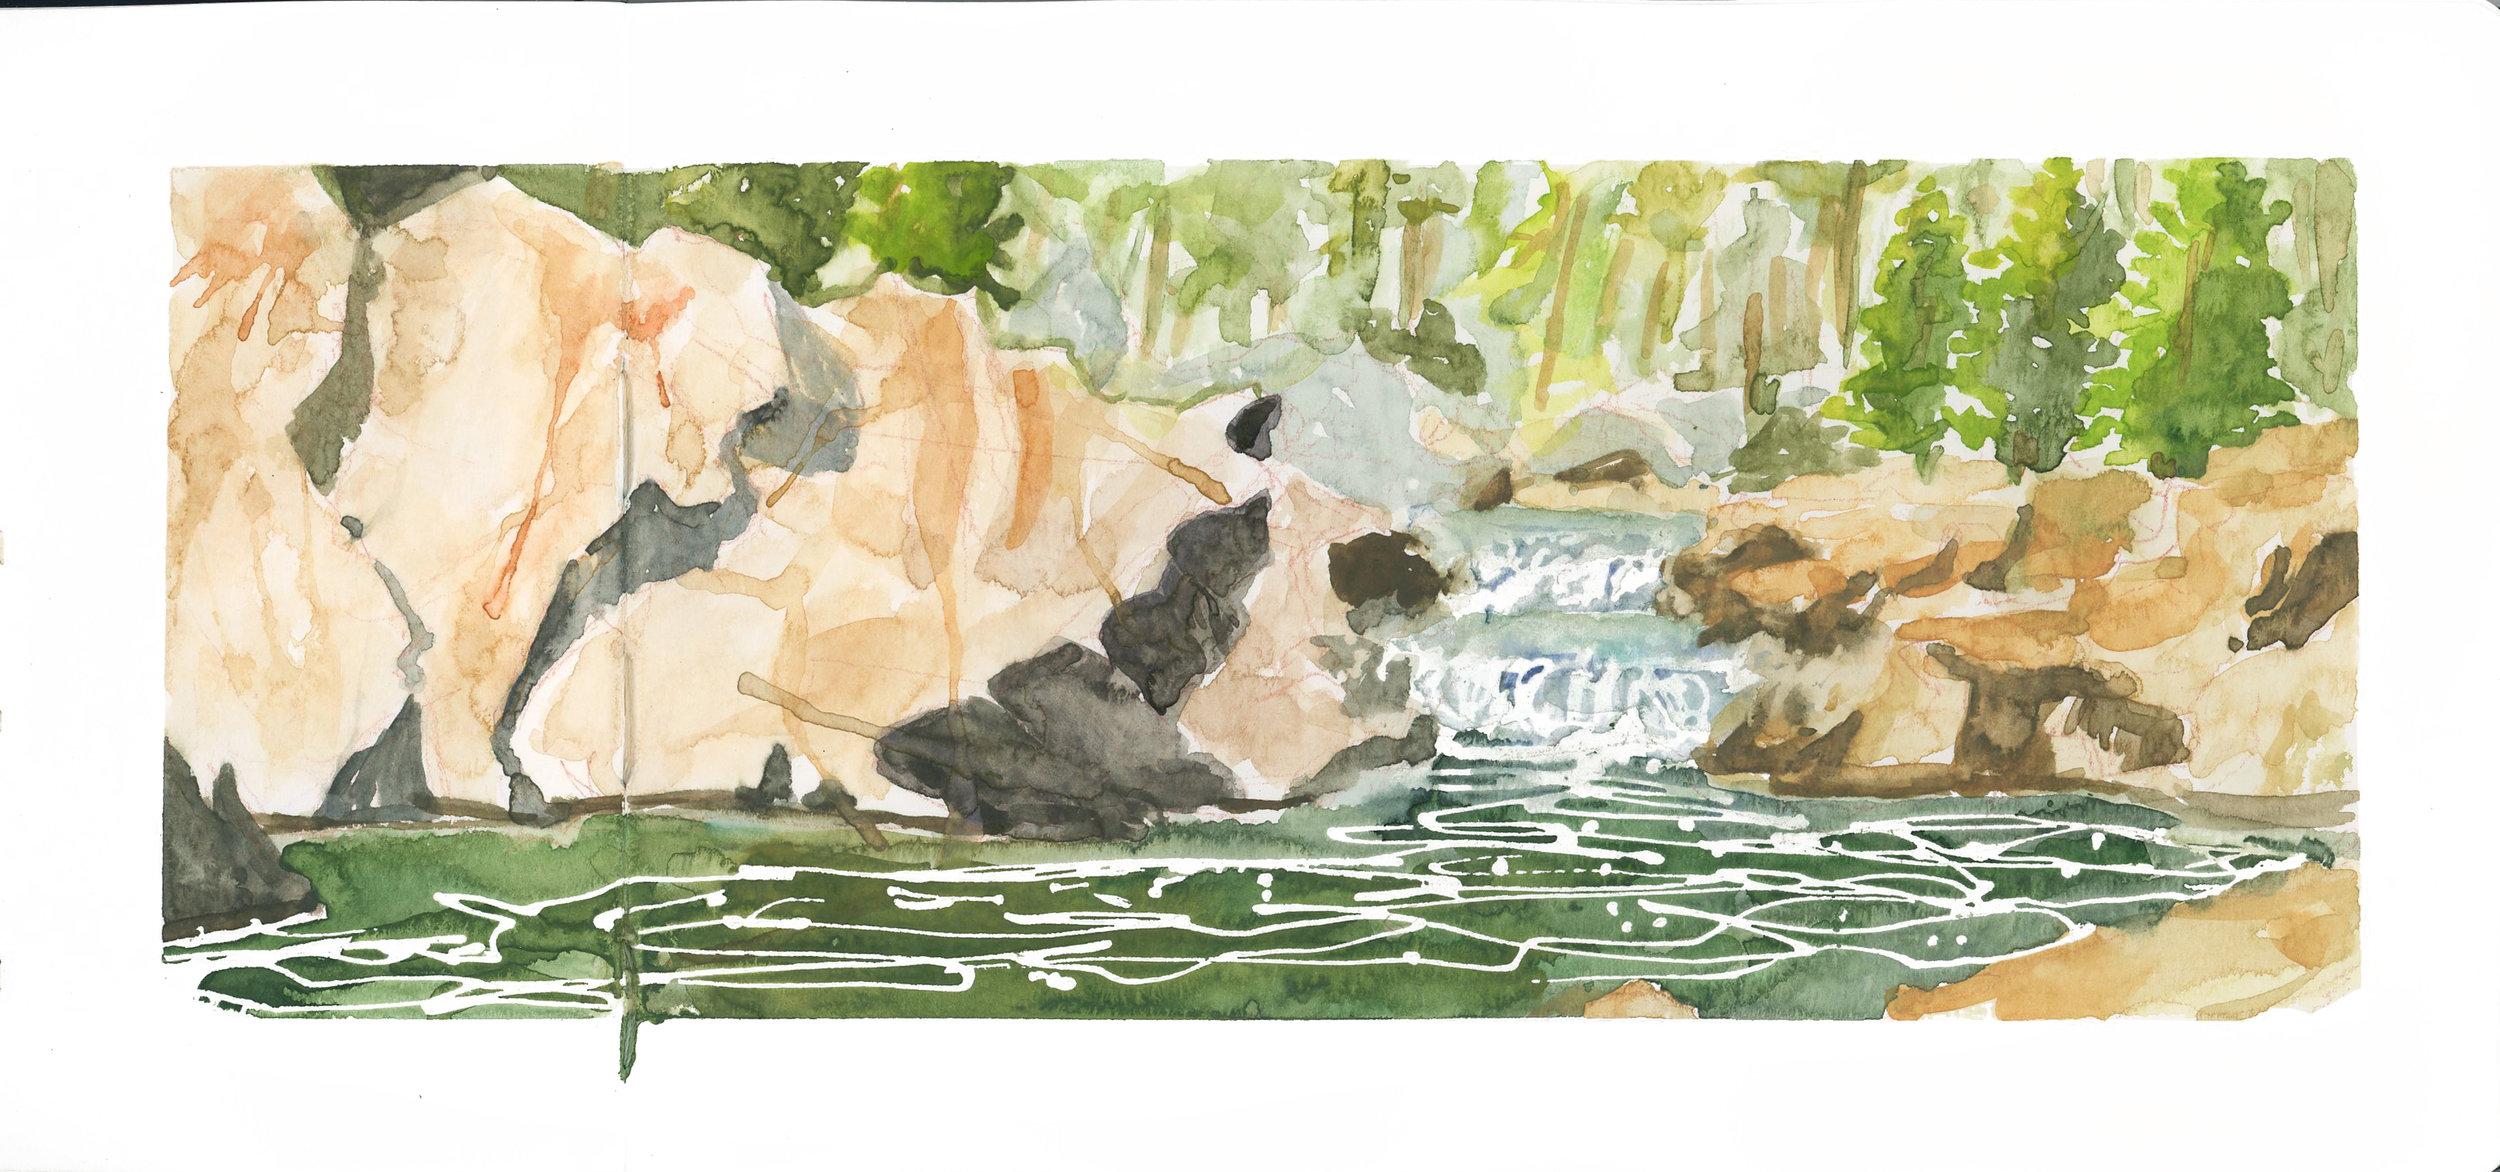 murphys stanislaus river.jpg